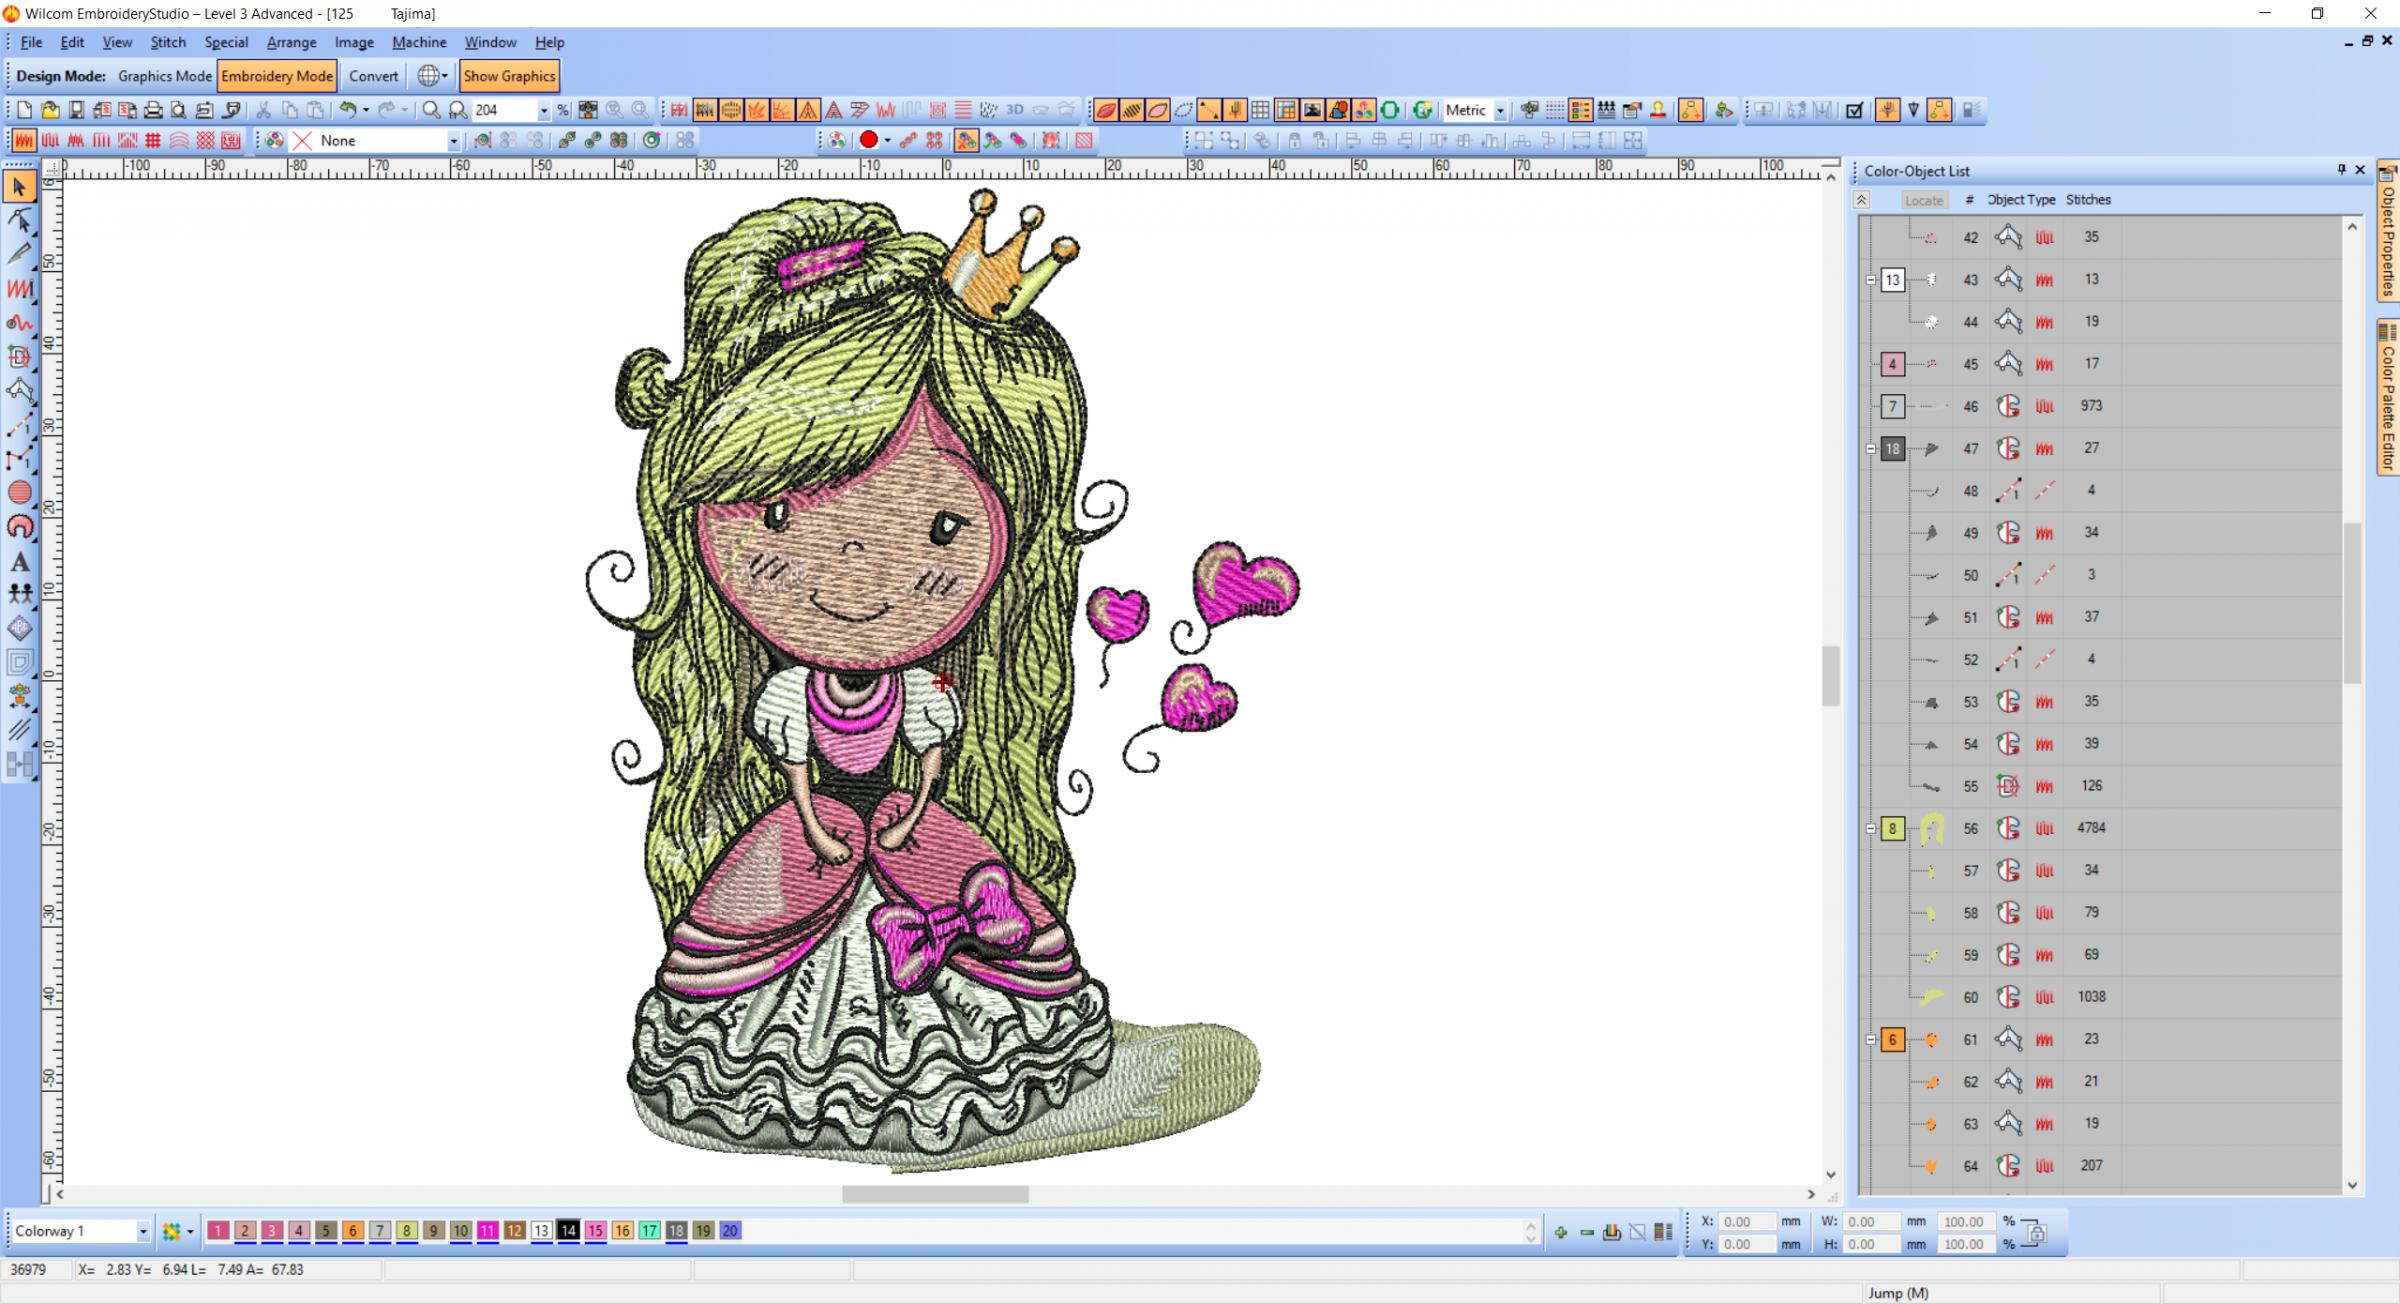 Princess design screenshot in Wilcom embroidery software